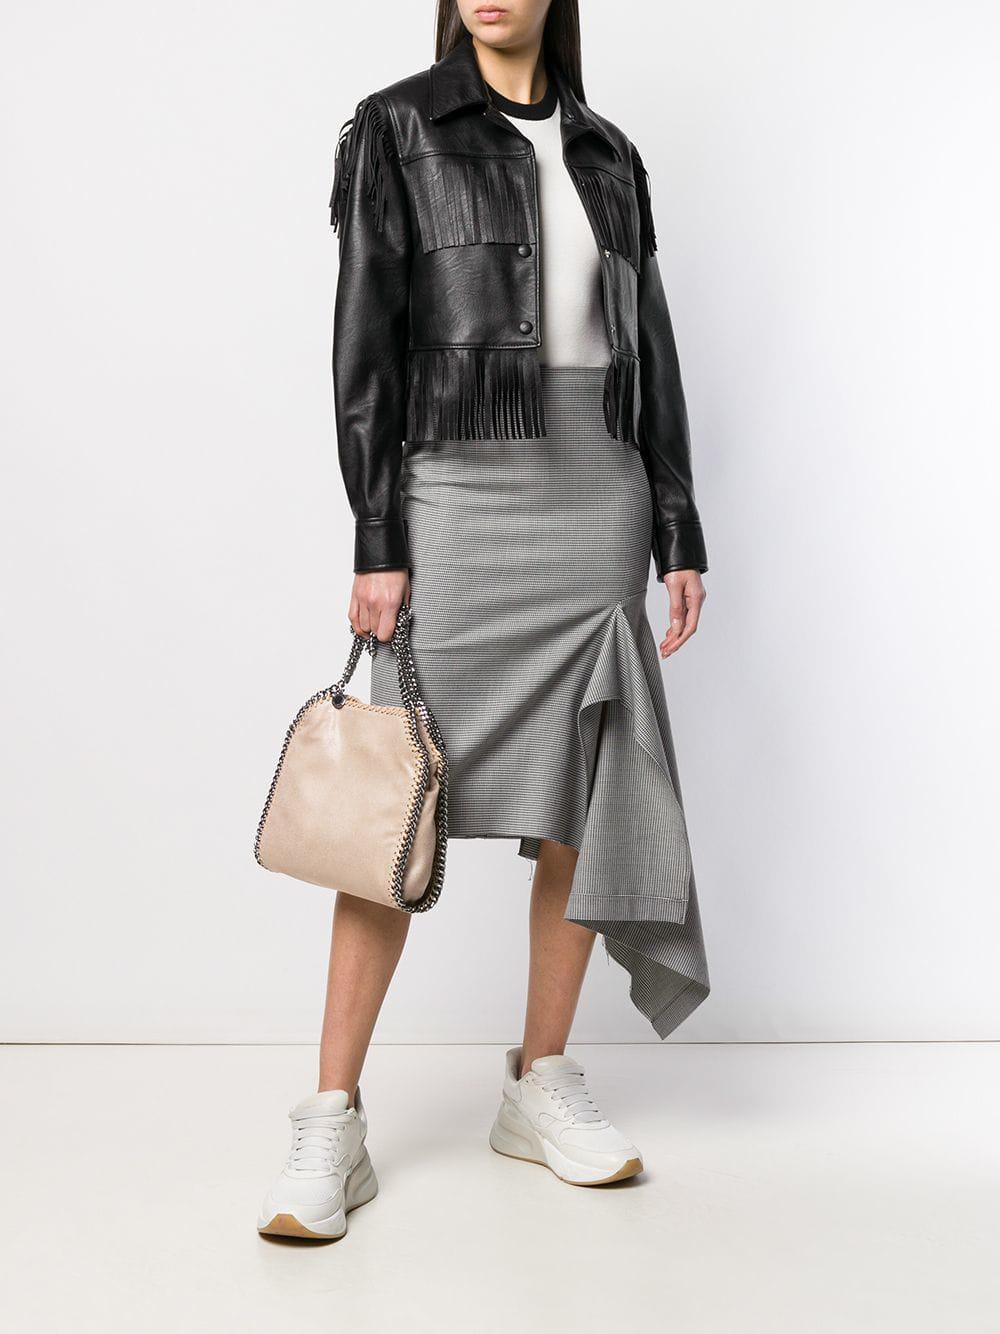 6095c43582d3 Lyst - Stella Mccartney Mini Falabella Bag in Natural